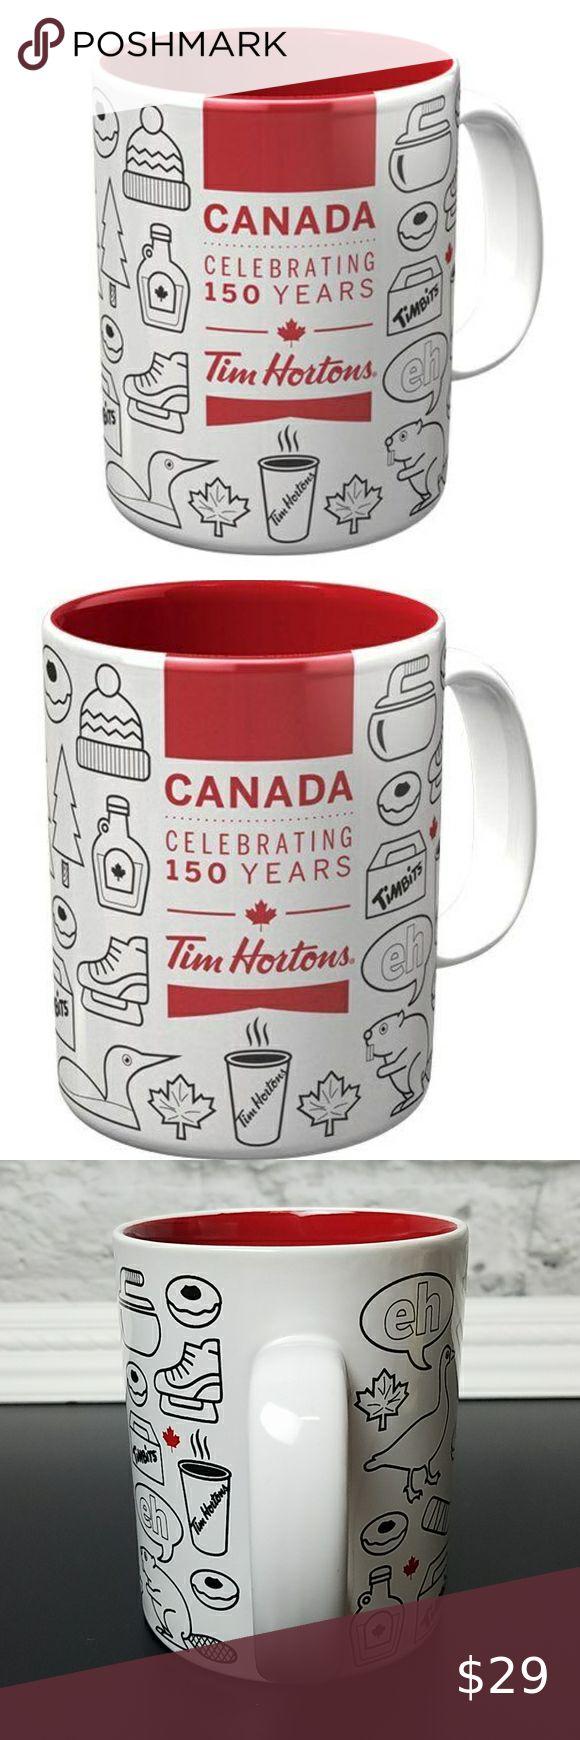 Tim Hortons Canada Celebrating 150 Years Mug Tim Hortons